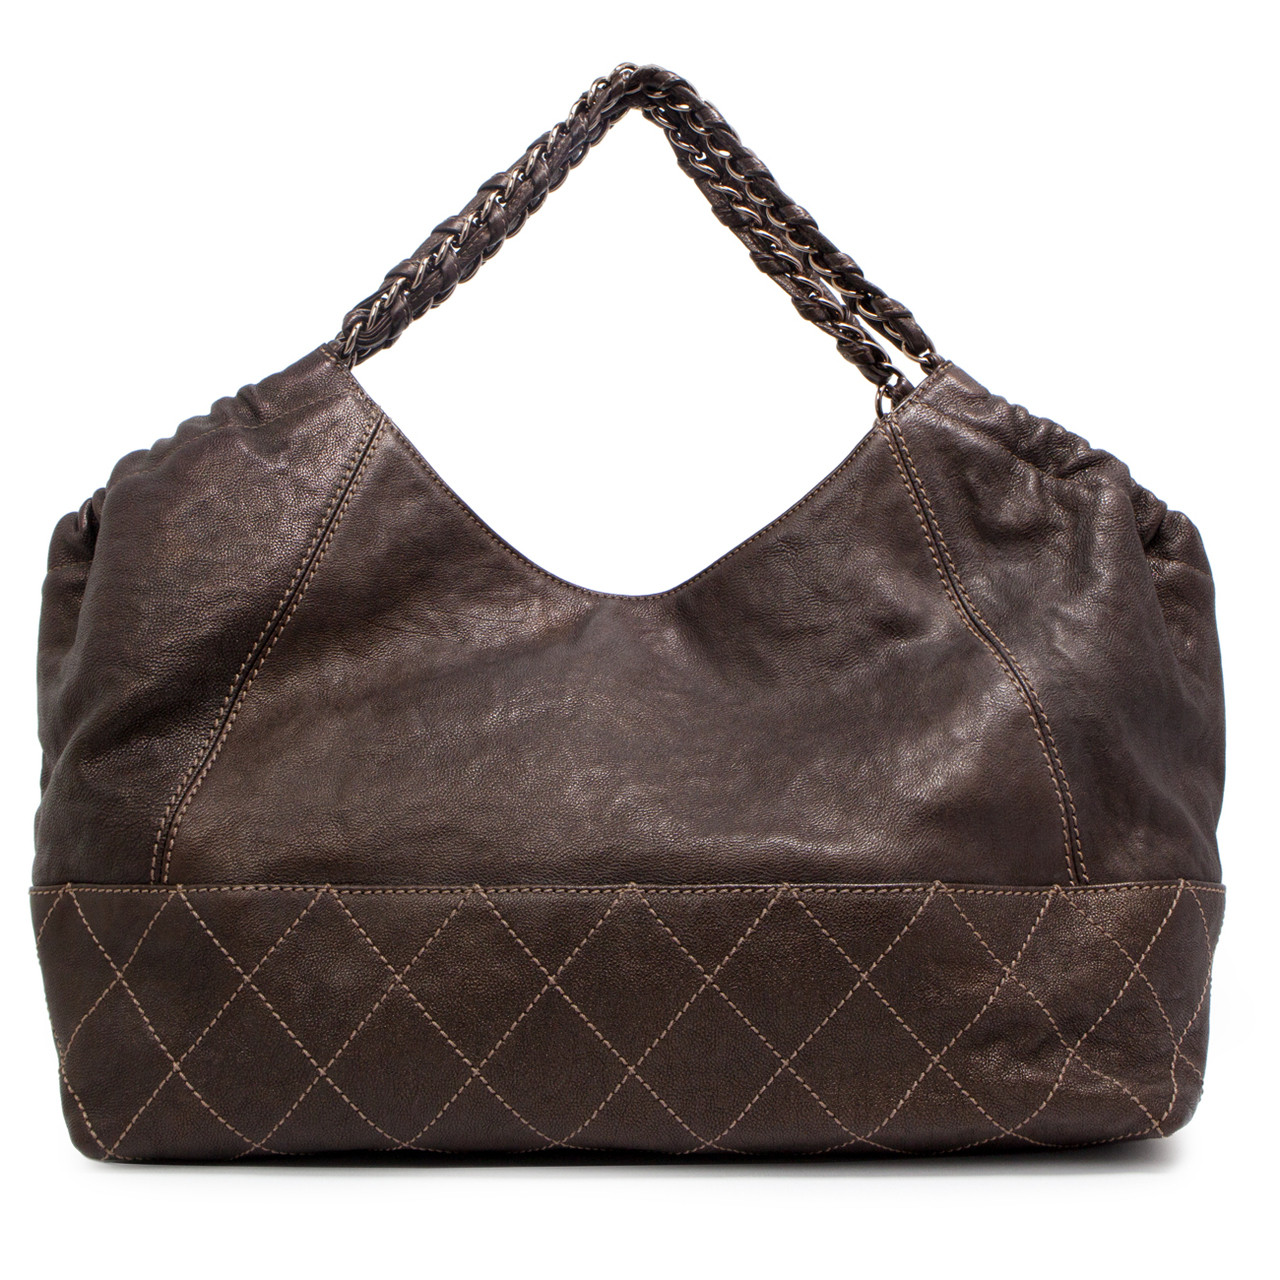 222928f867 Chanel Baby Coco Cabas Hobo Bag - modaselle